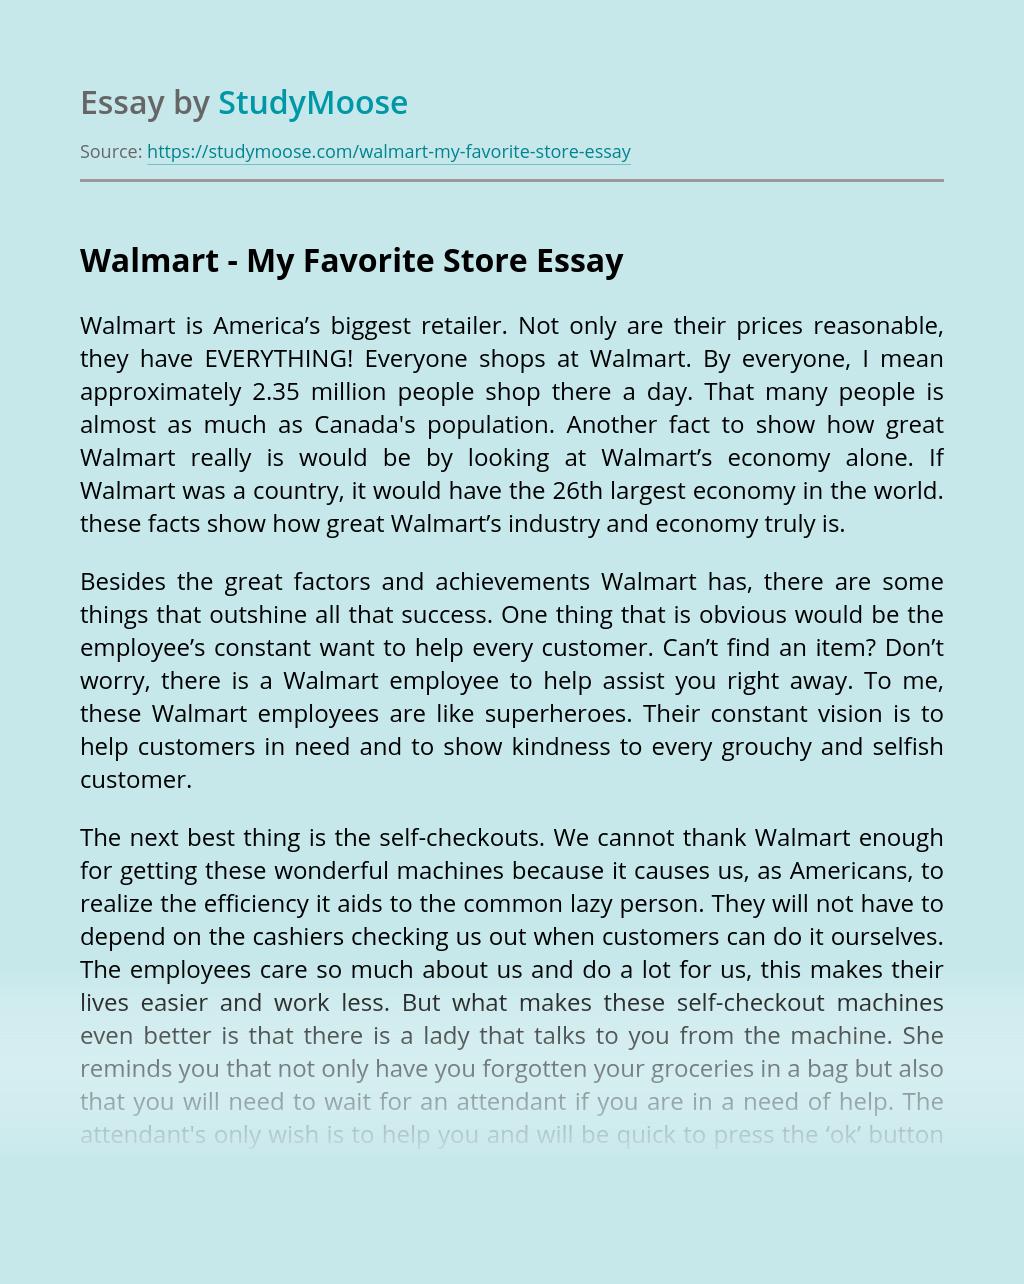 Walmart – My Favorite Store